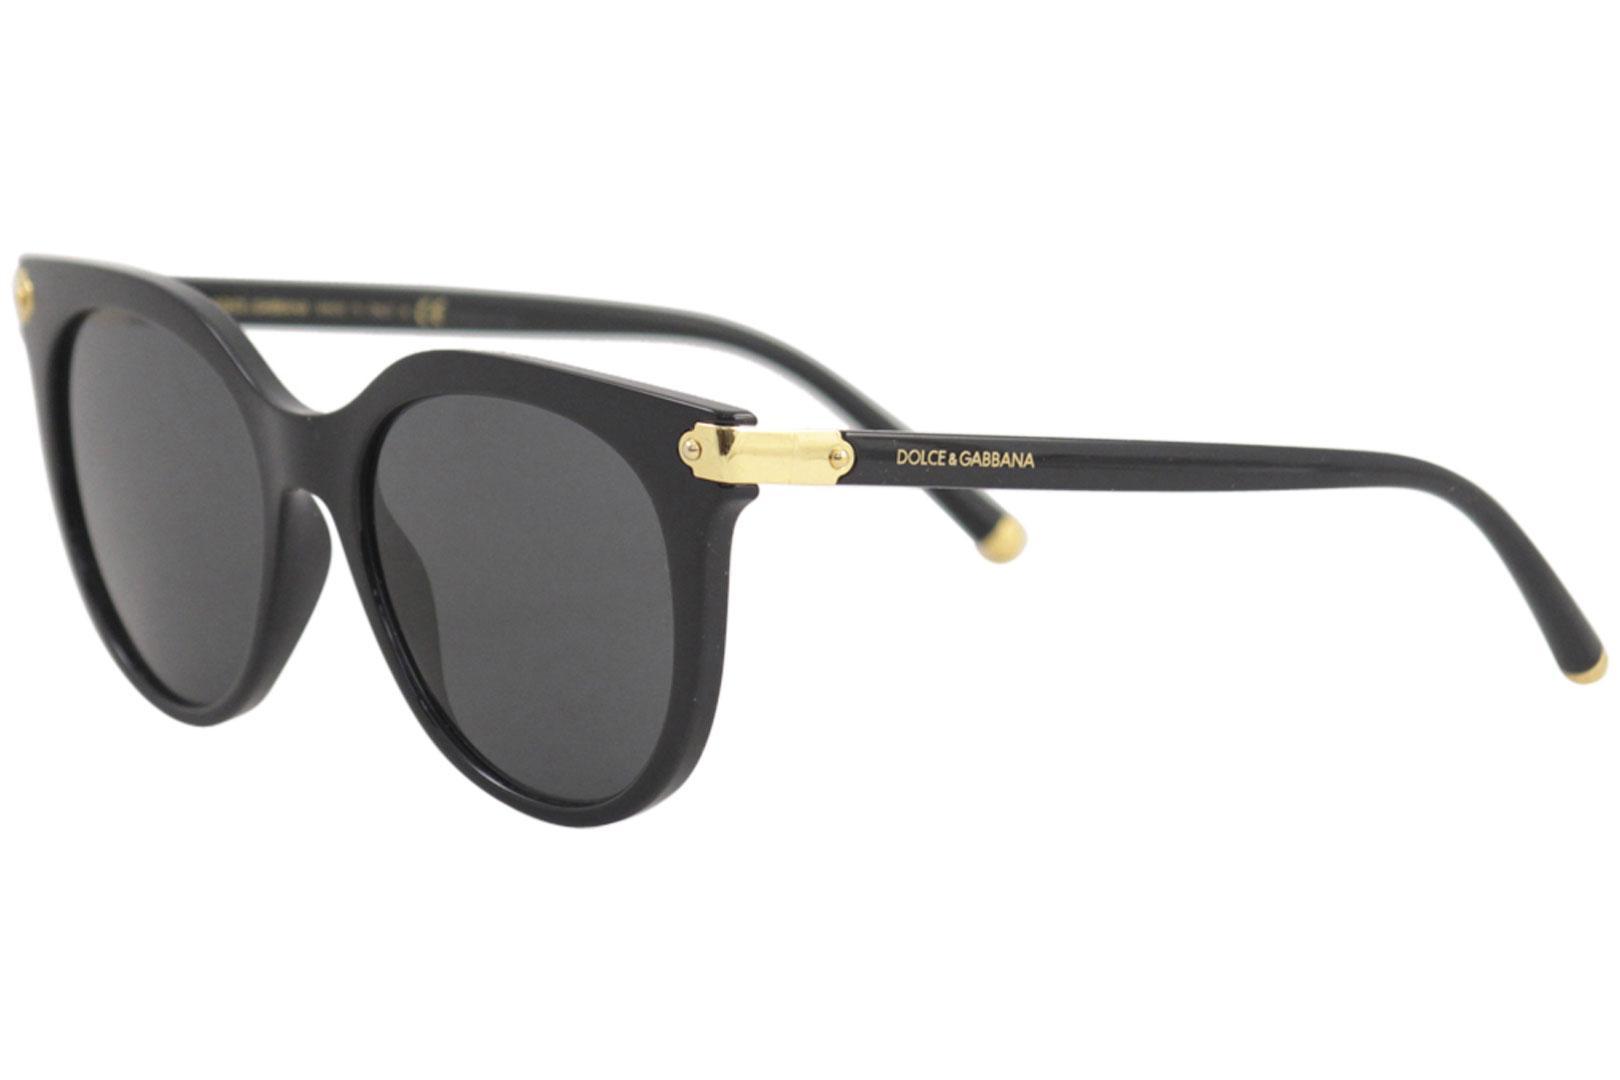 70910b09513e Dolce & Gabbana D&G DG6117 DG/6117 501/87 Black/Gold Square ...